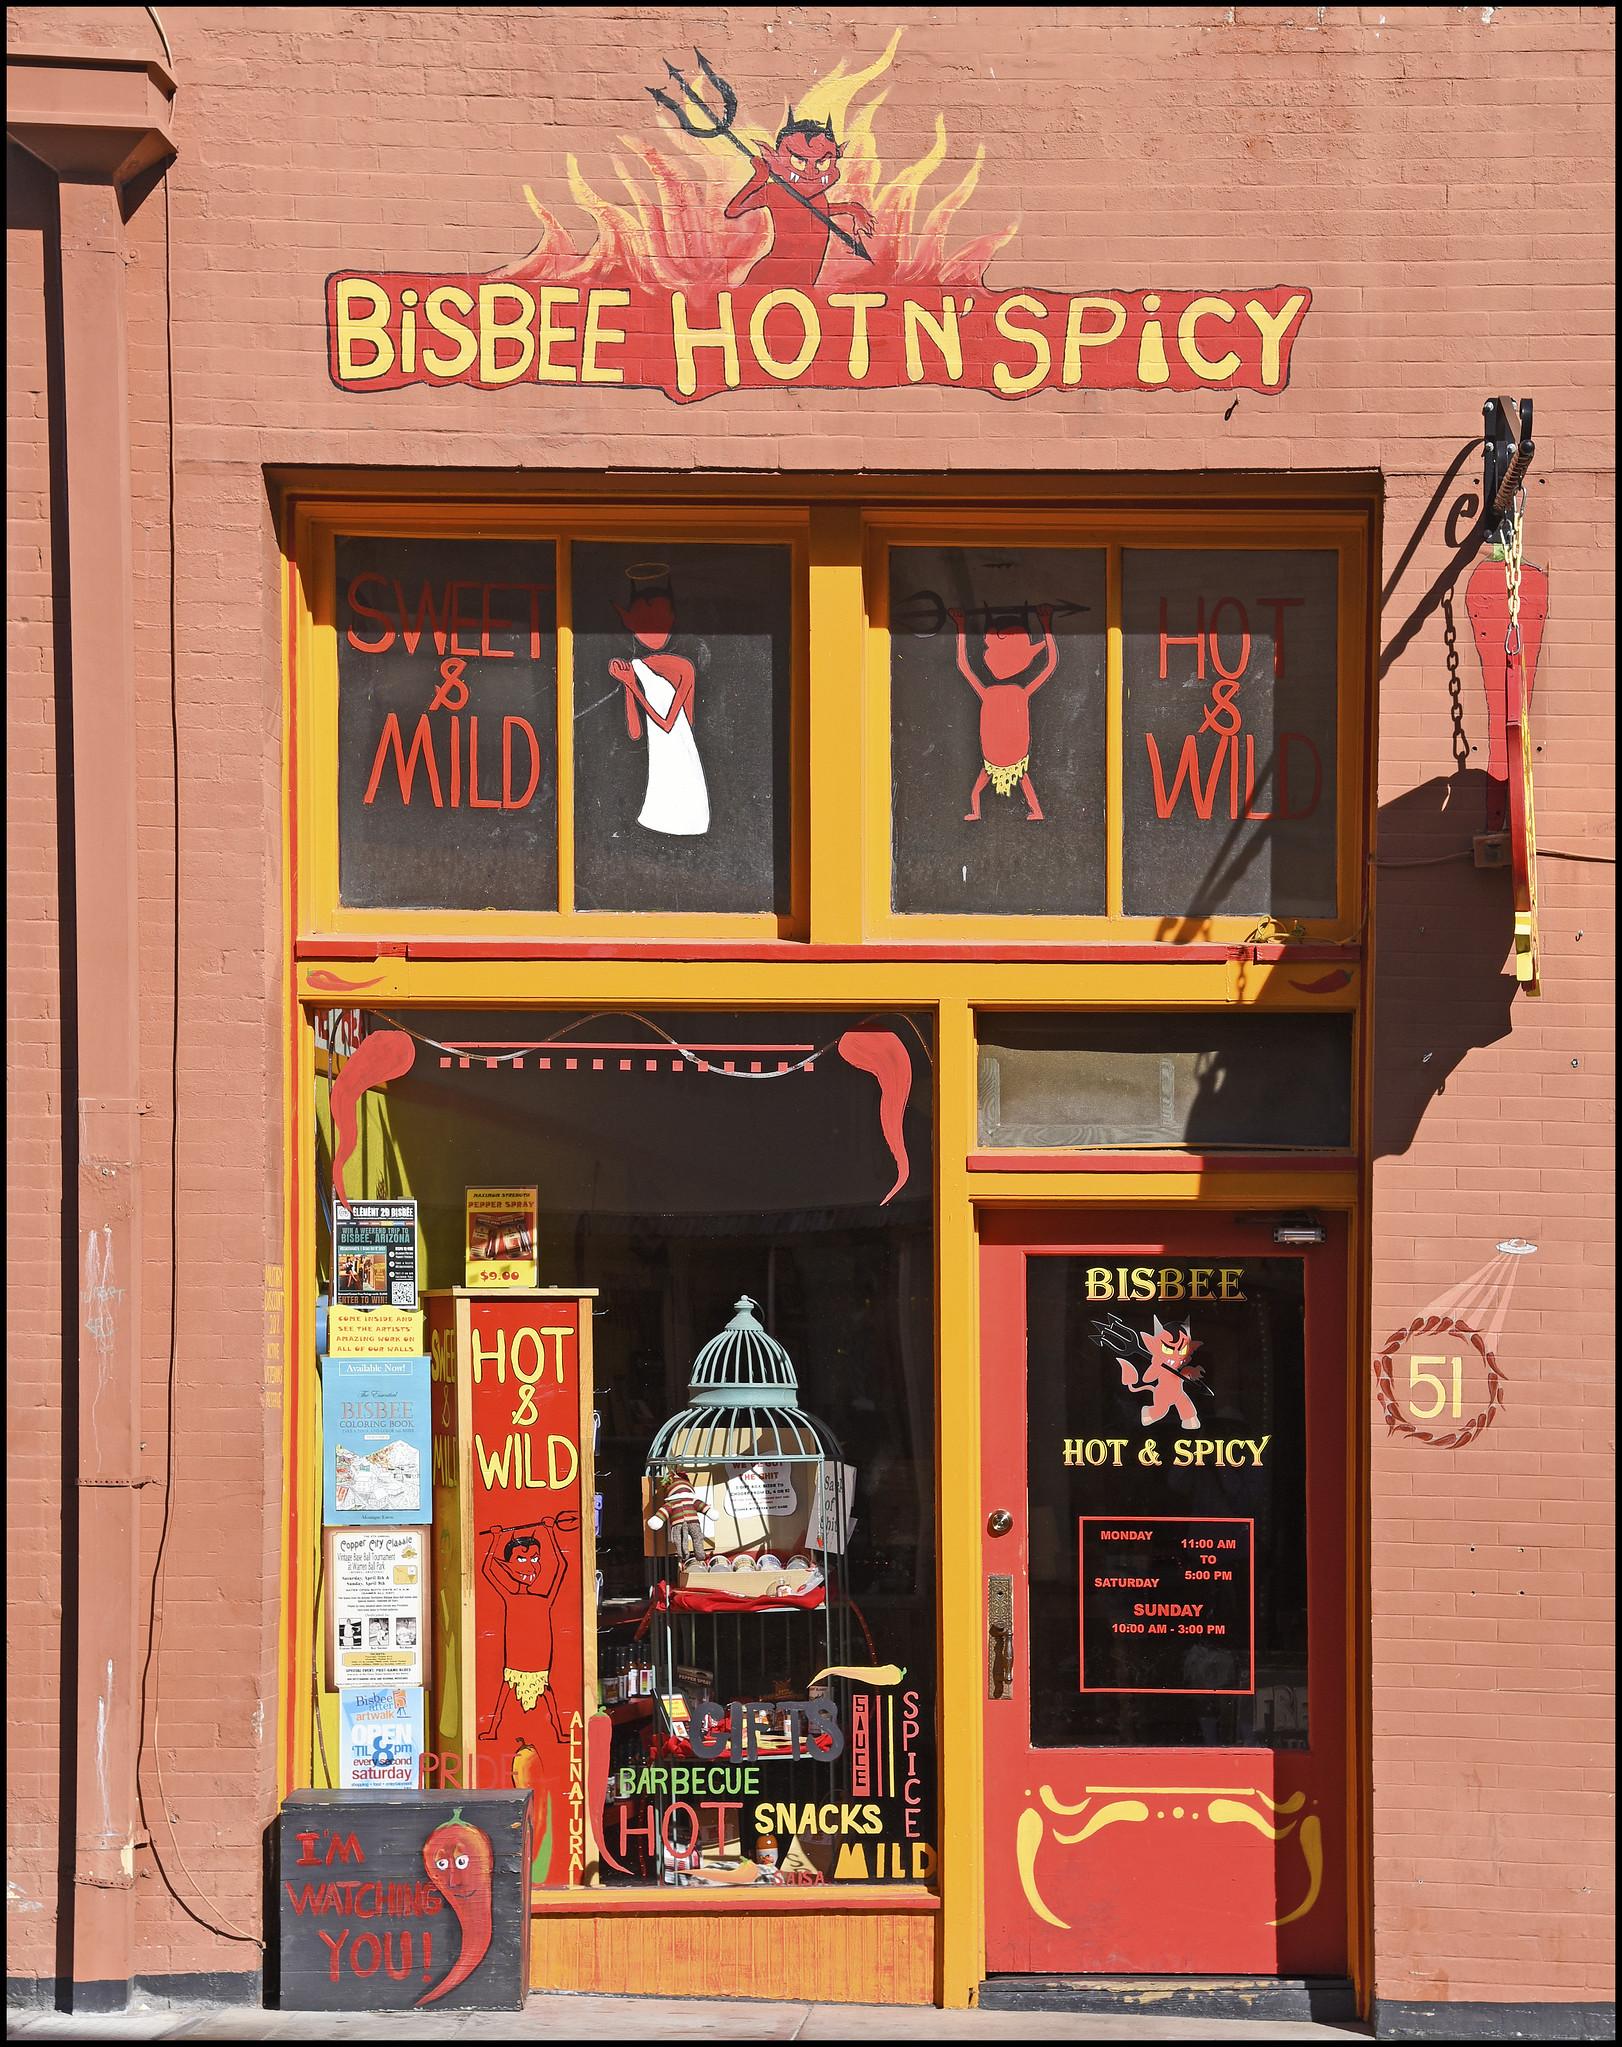 Bisbee Hot N' Spicy storefront.